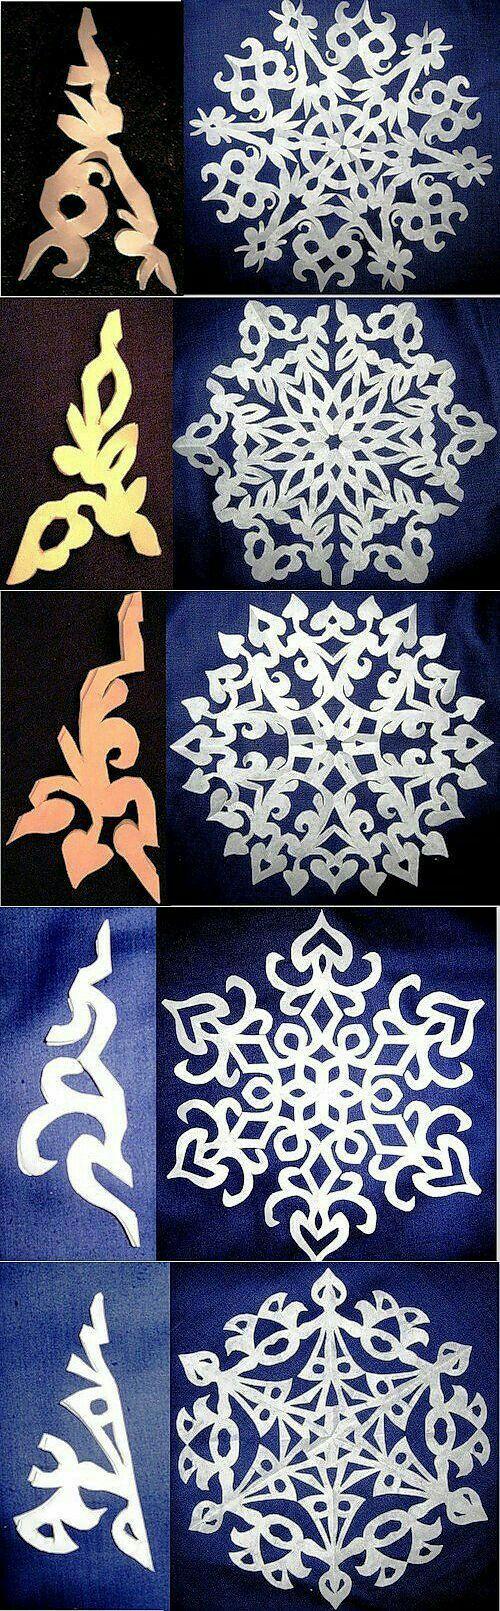 Fiocco di neve creativo.  Fai da te